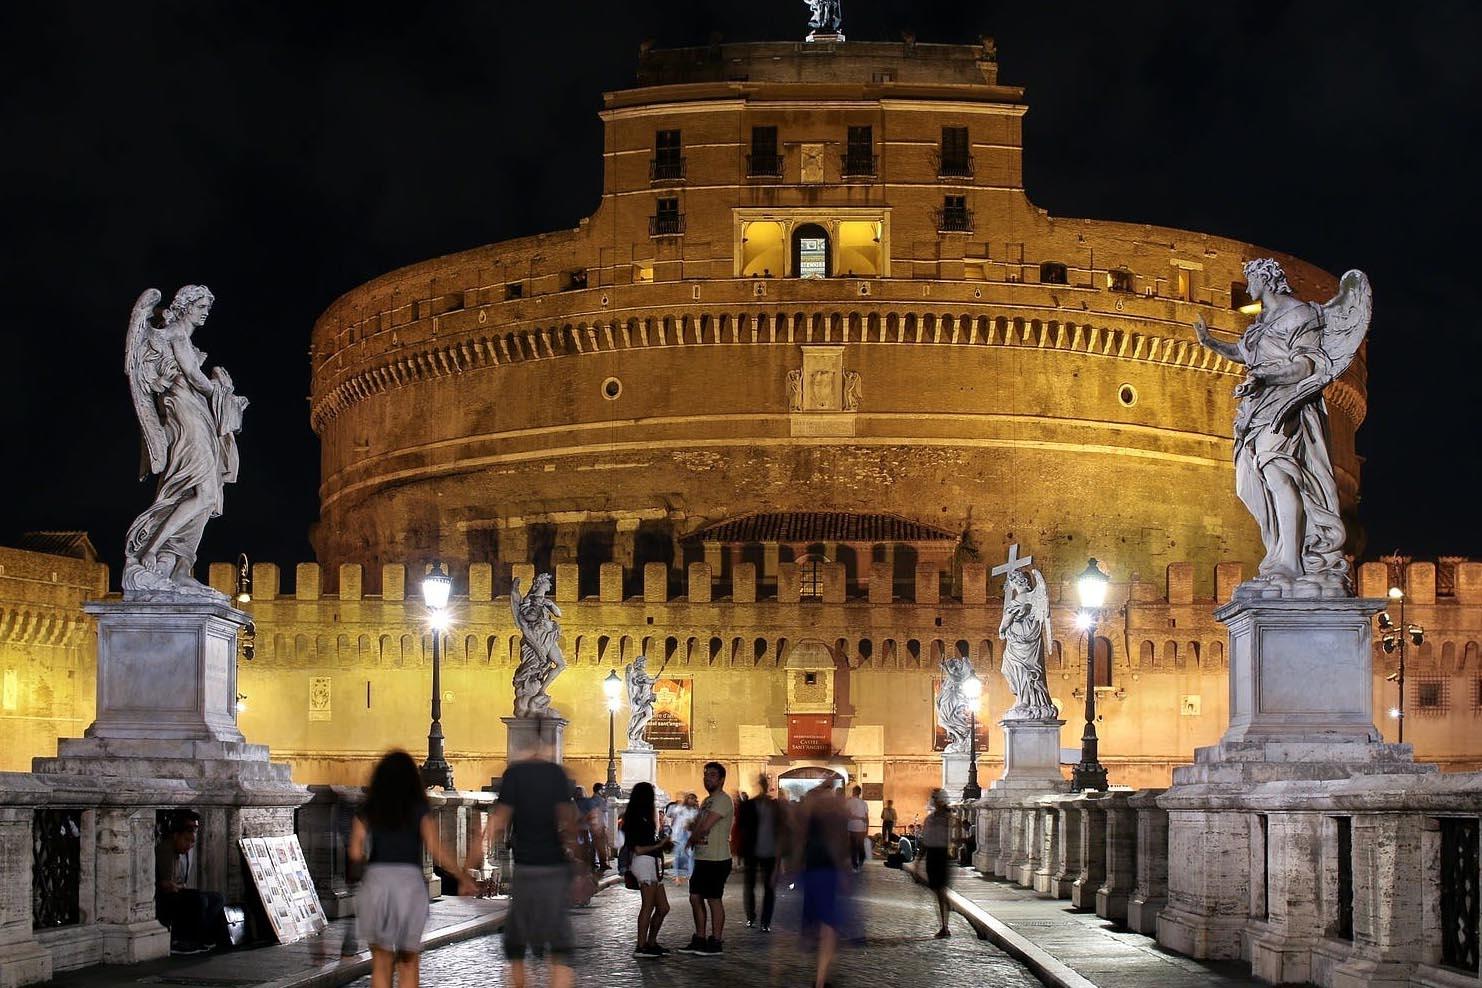 ITALY BOXES_0007_021 Rome at Nite